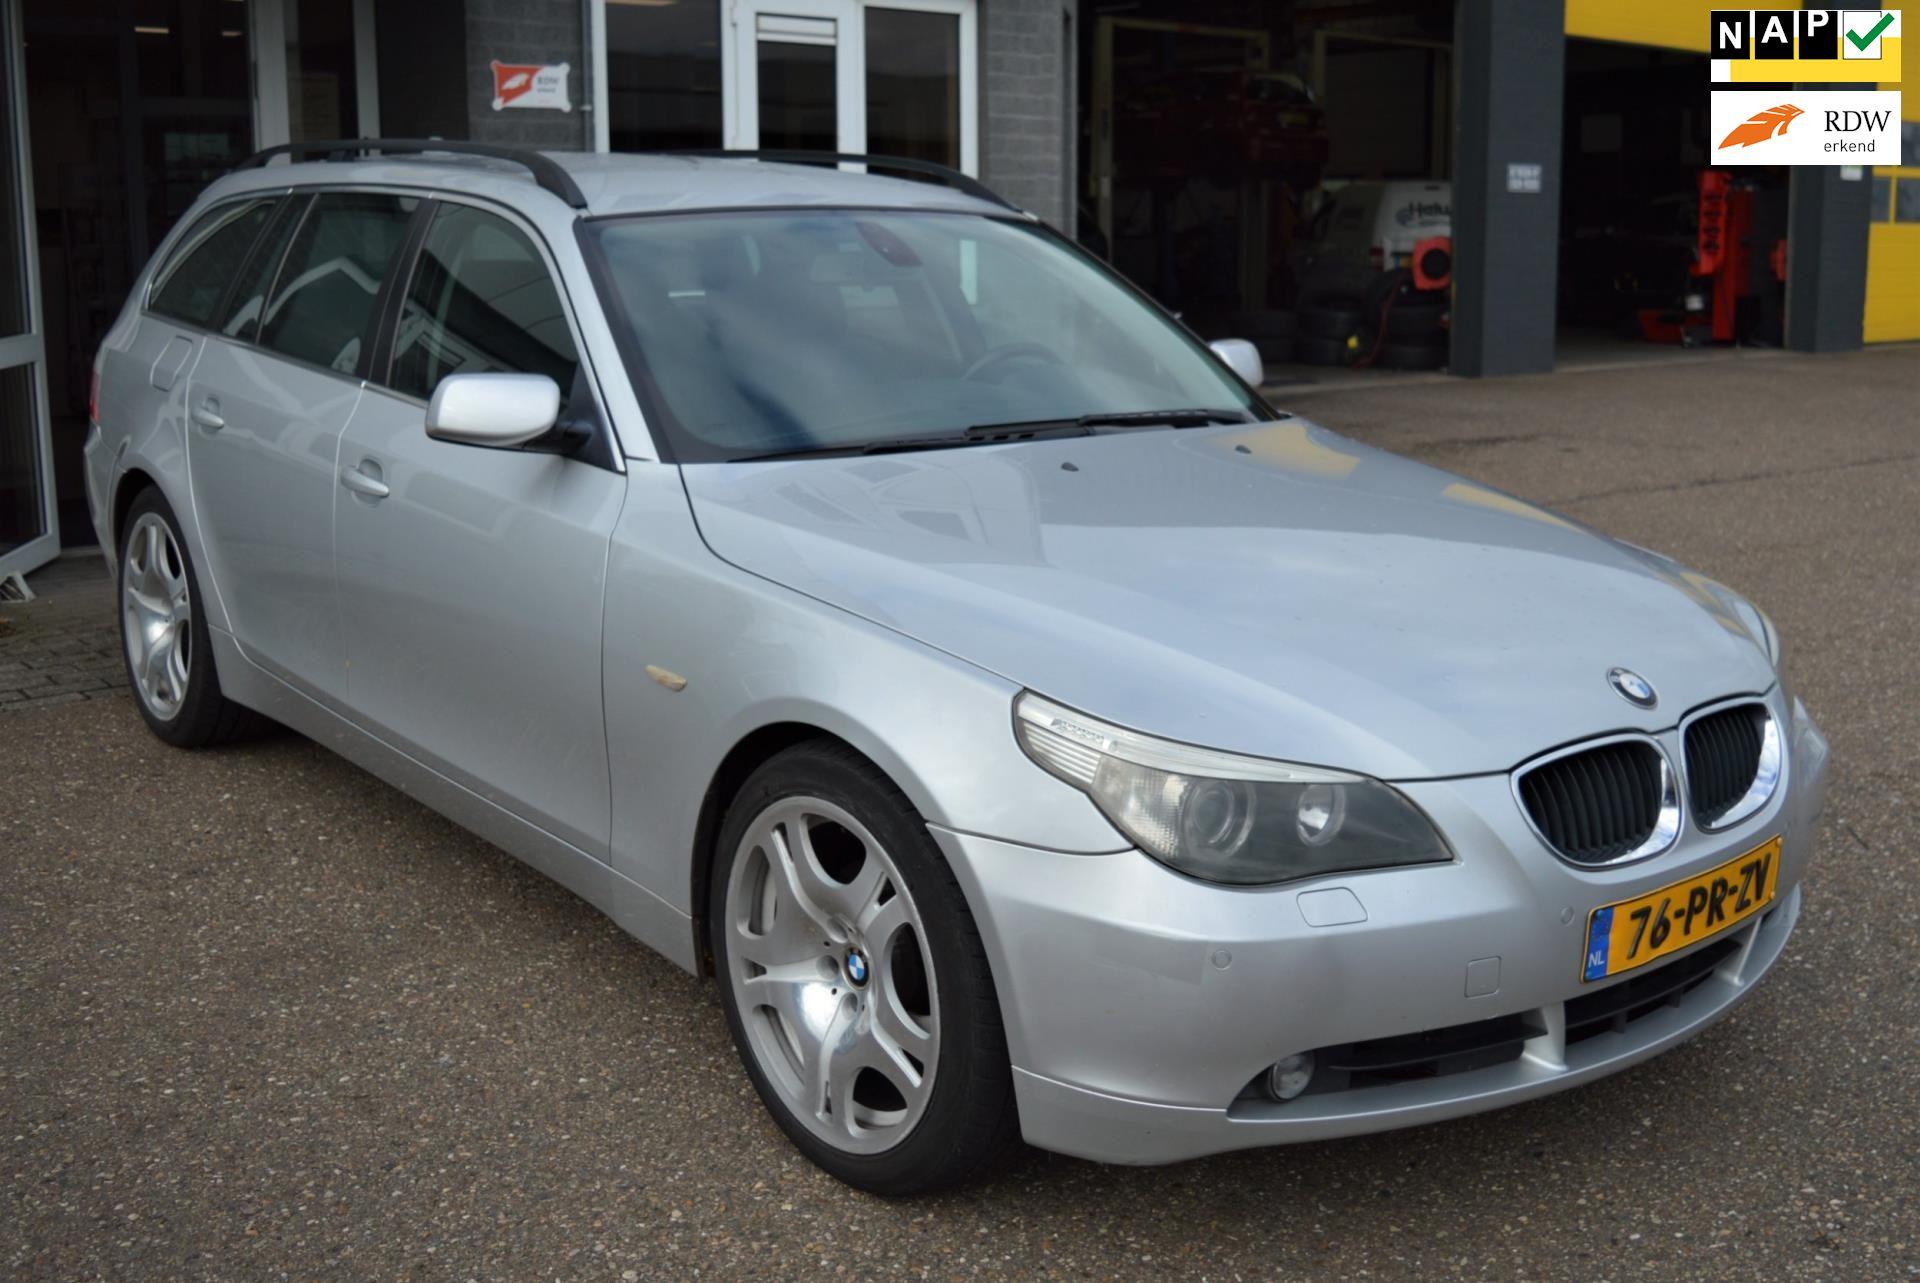 BMW 5-serie Touring occasion - Autobedrijf Ton Kerkhoffs Bv